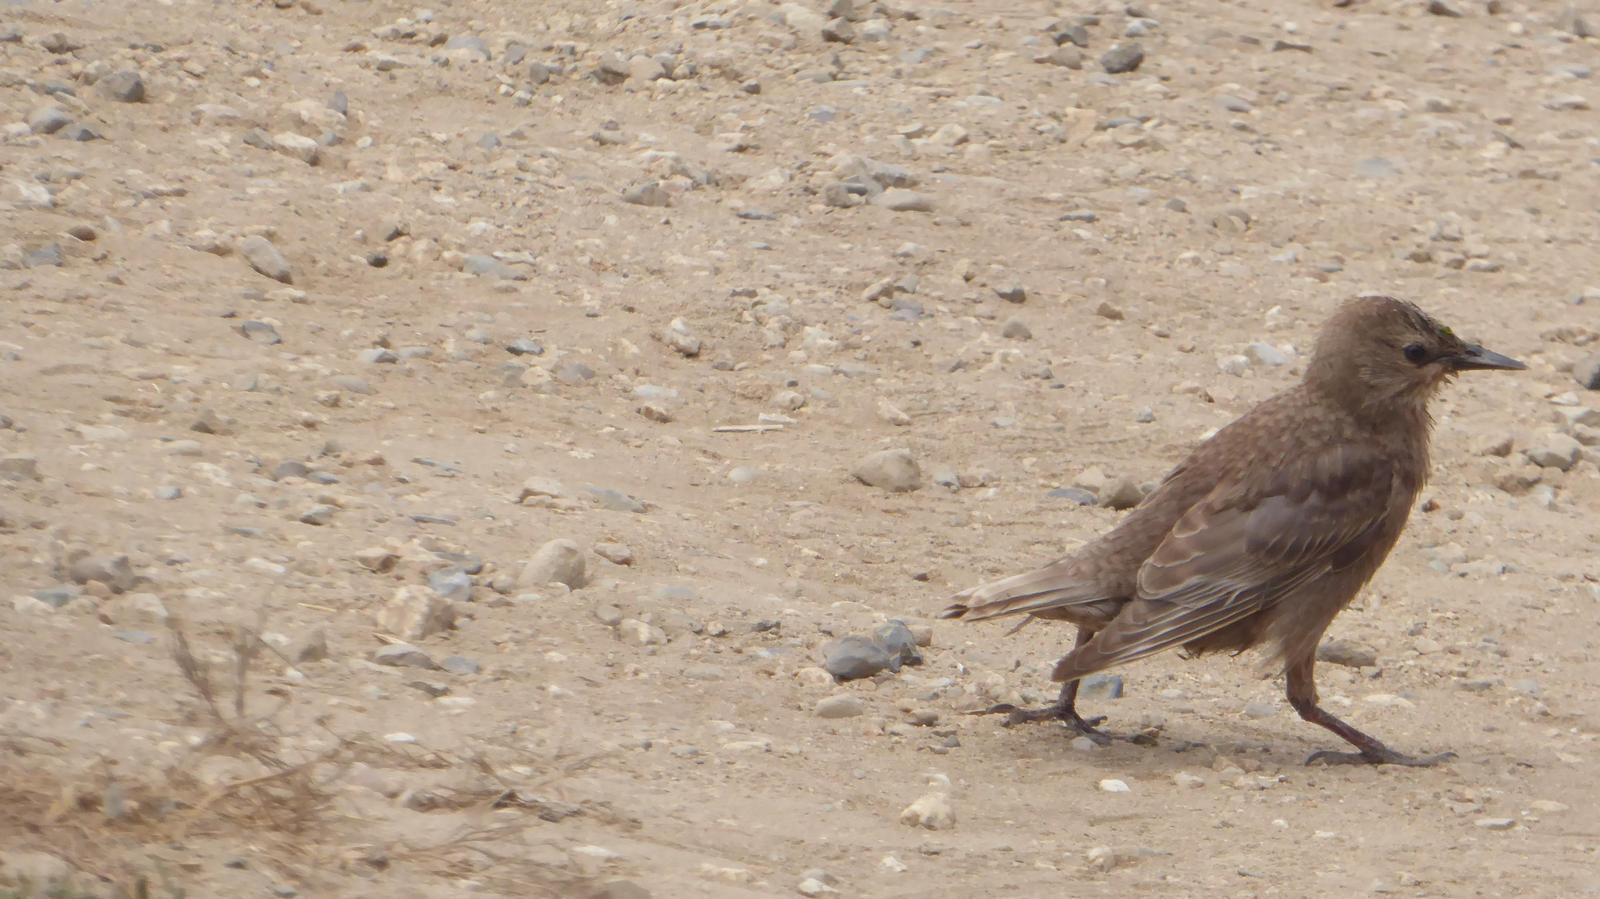 European Starling Photo by Daliel Leite